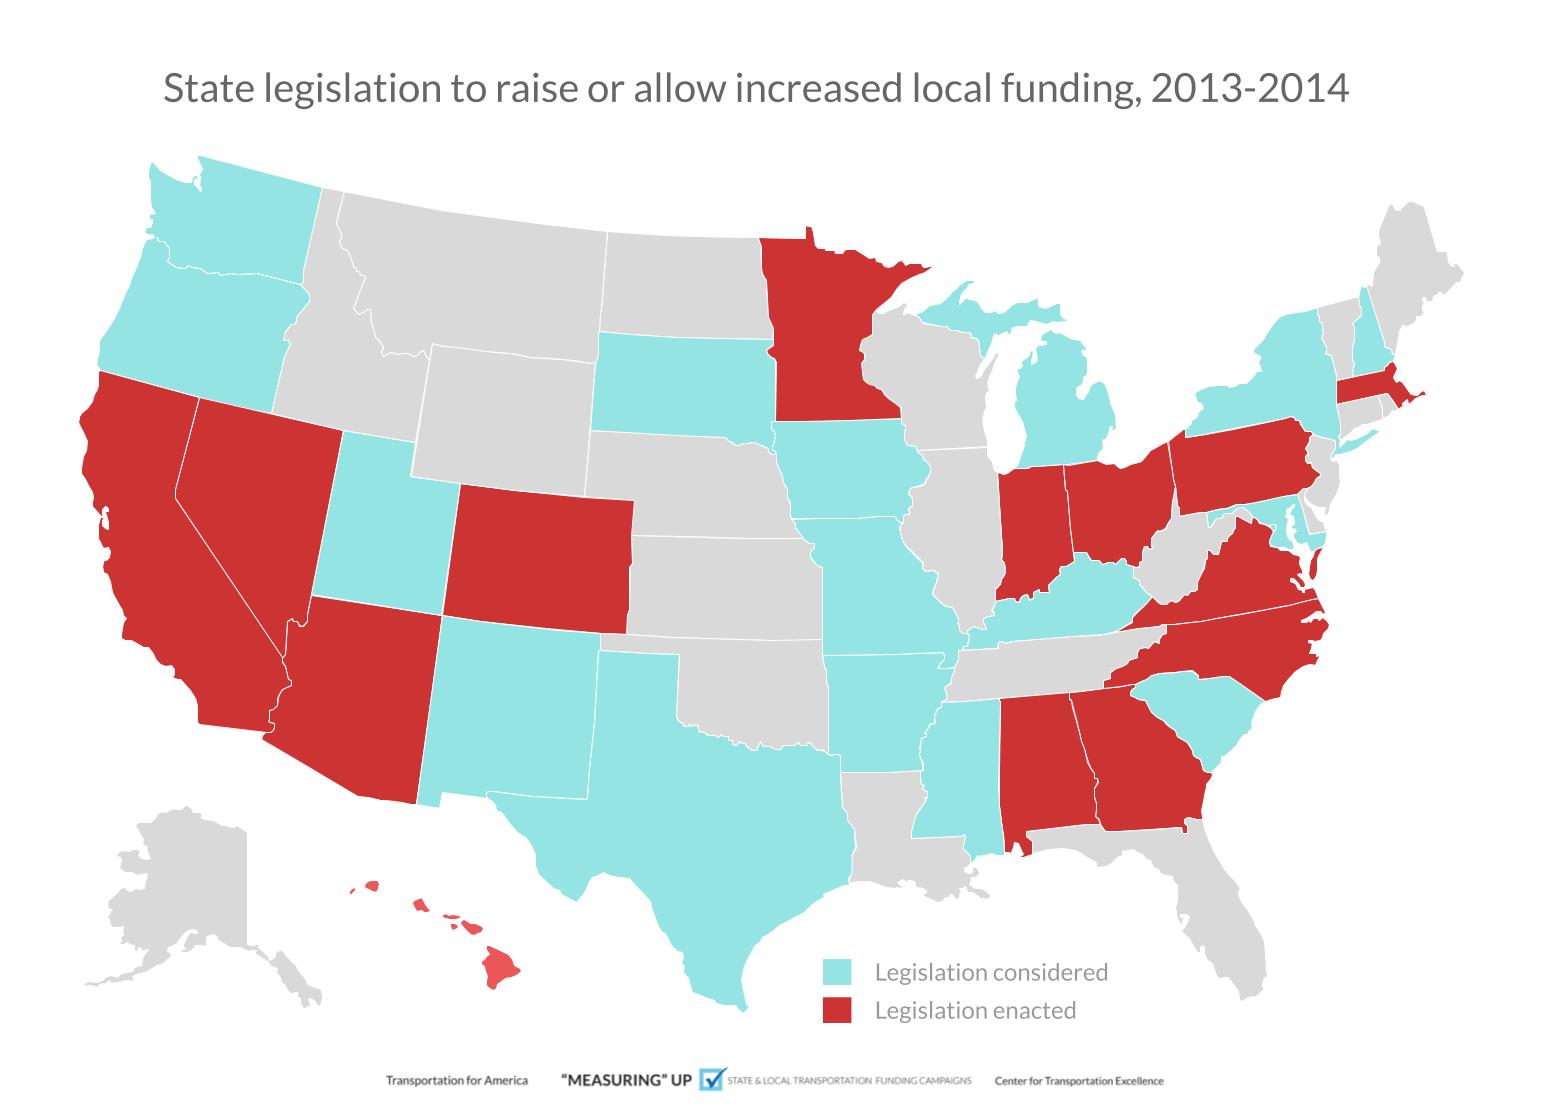 Image: State legislation raising or allowing increased local funding, 2013-2014